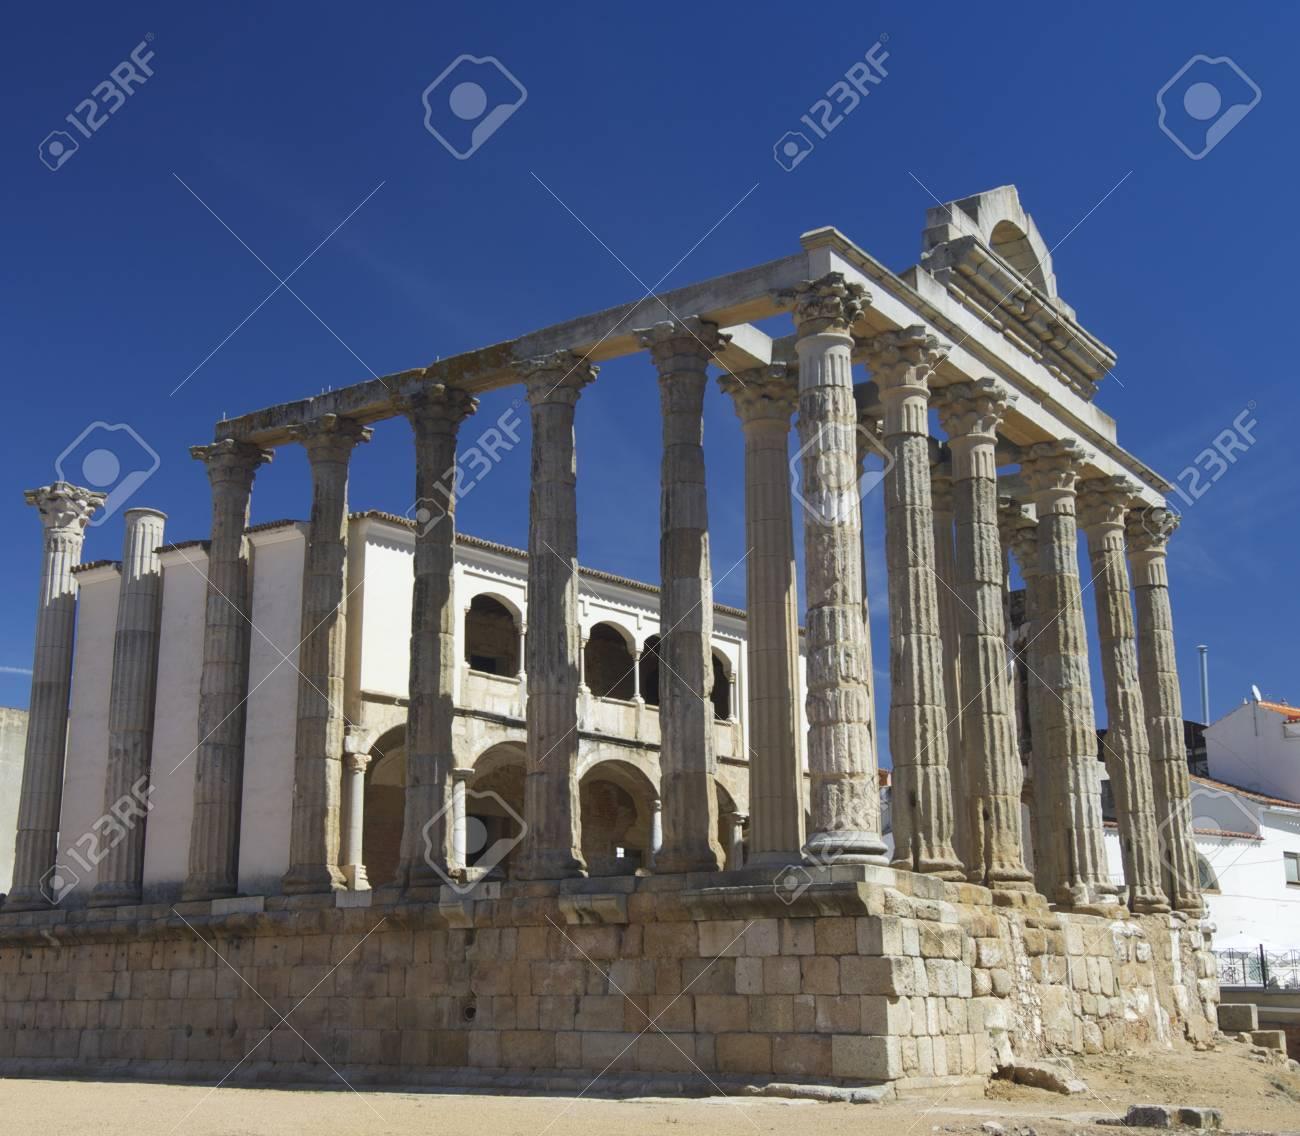 Columnas Del Templo Romano De Diana Merida Badajoz Extremadura Espana